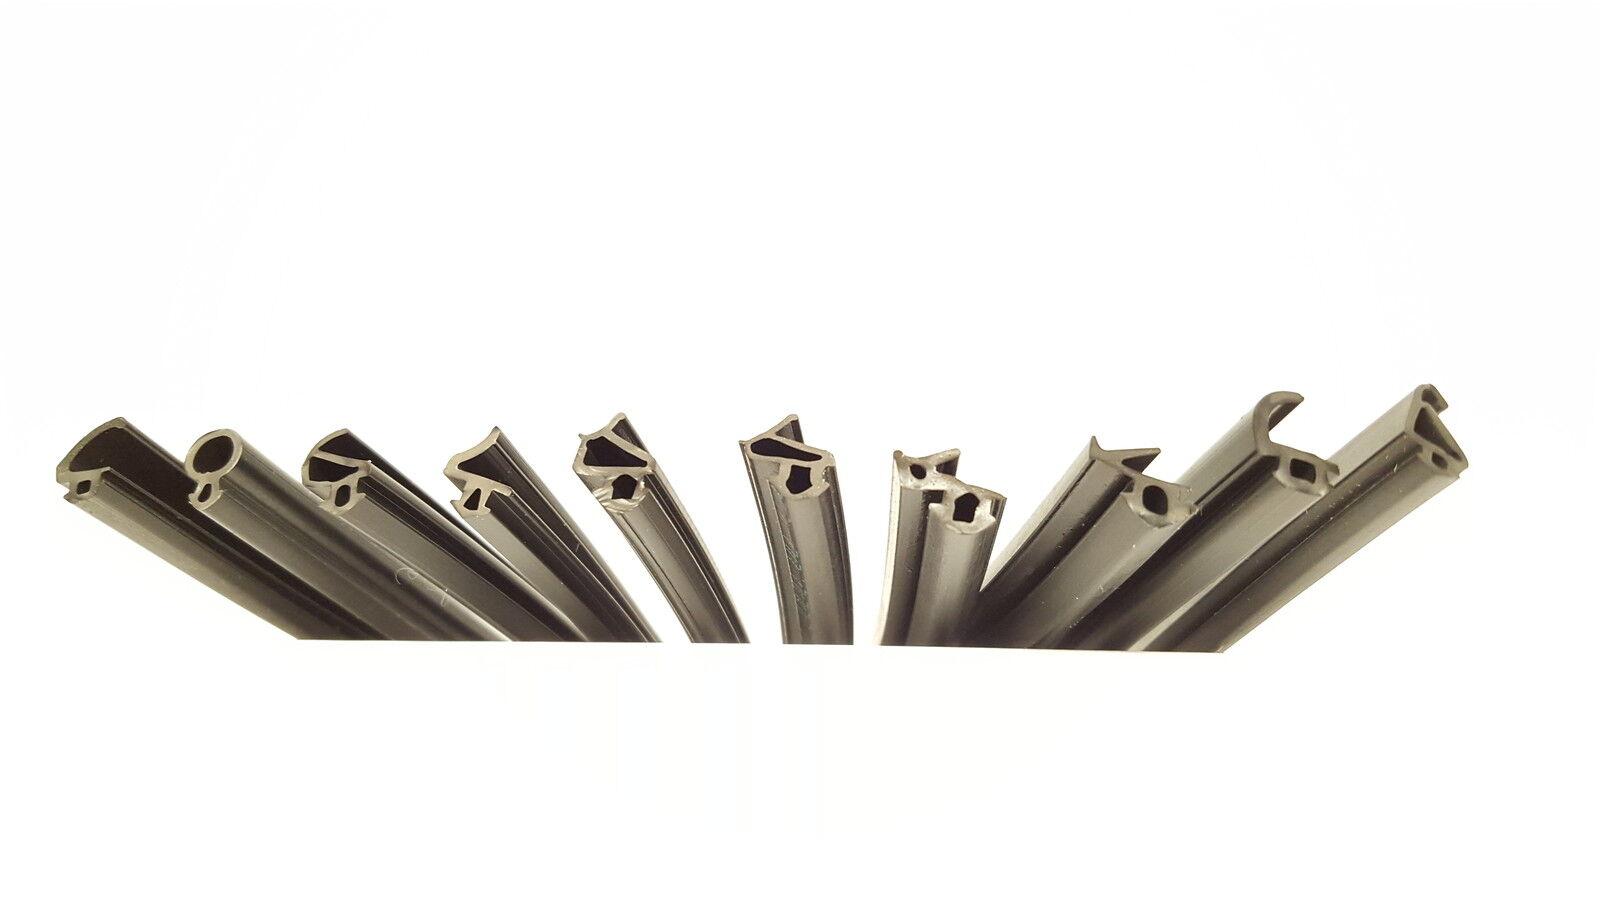 GP    m, m, m, Fensterdichtung  V01  100m   Kunststofffenster Gummi-Dichtung   Good Design  367ff4